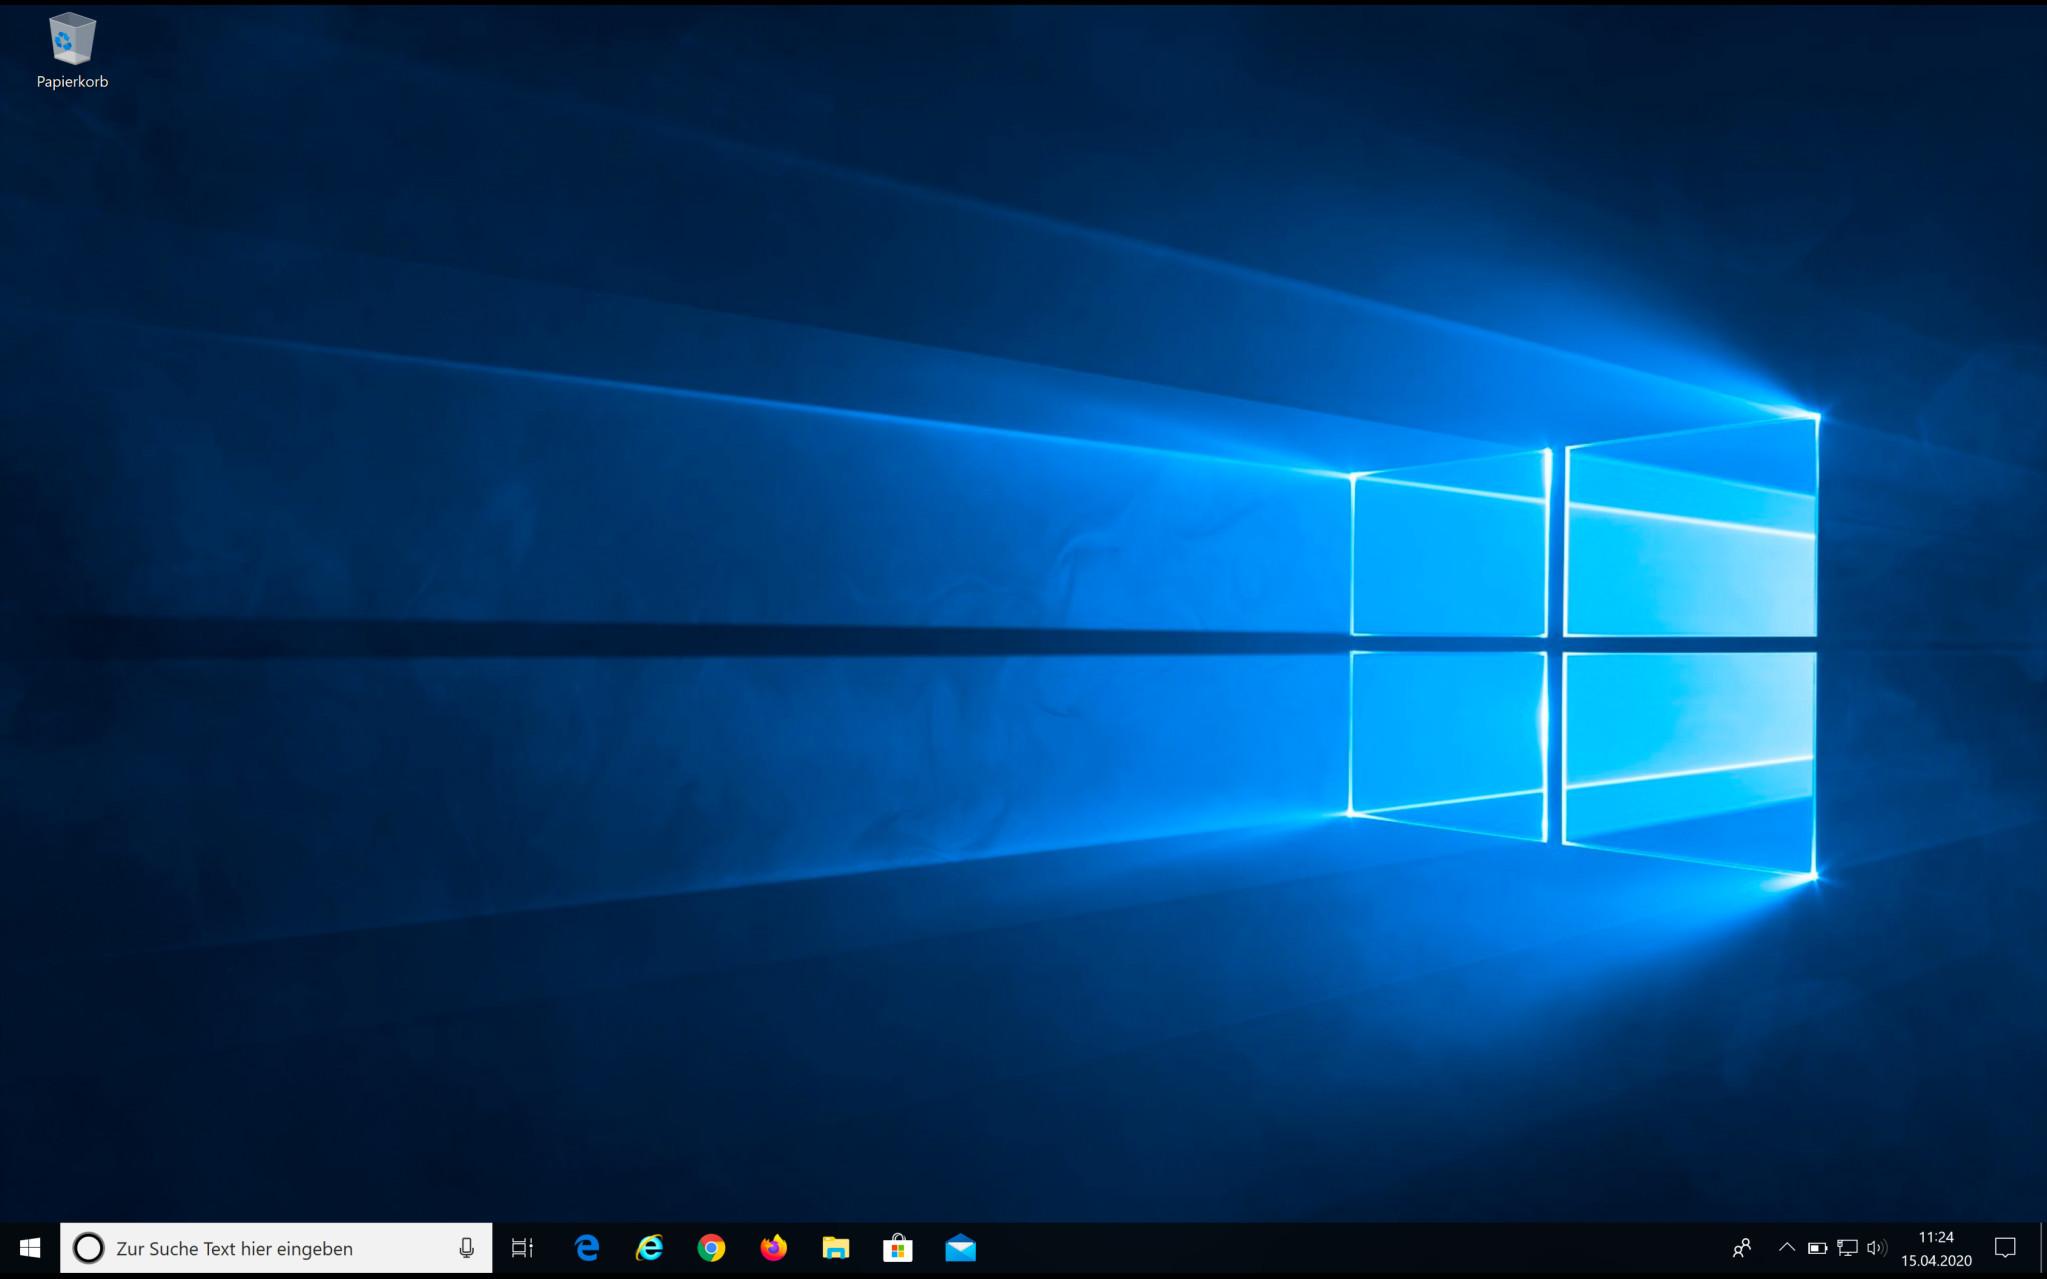 Screenshot 1 - Windows 10 (32 Bit)